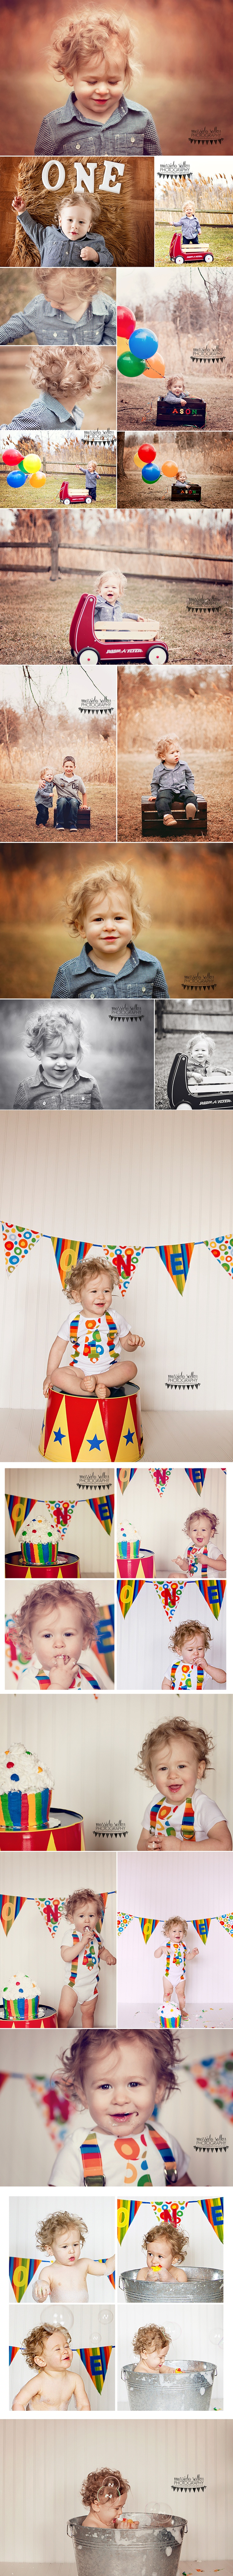 Marsida Salku Photography ~ Windsor Ontario Photographer. circus themed cake smash. First birthday cake smash. Little boy cake smash and bubble bath.  first birthday bubble bath